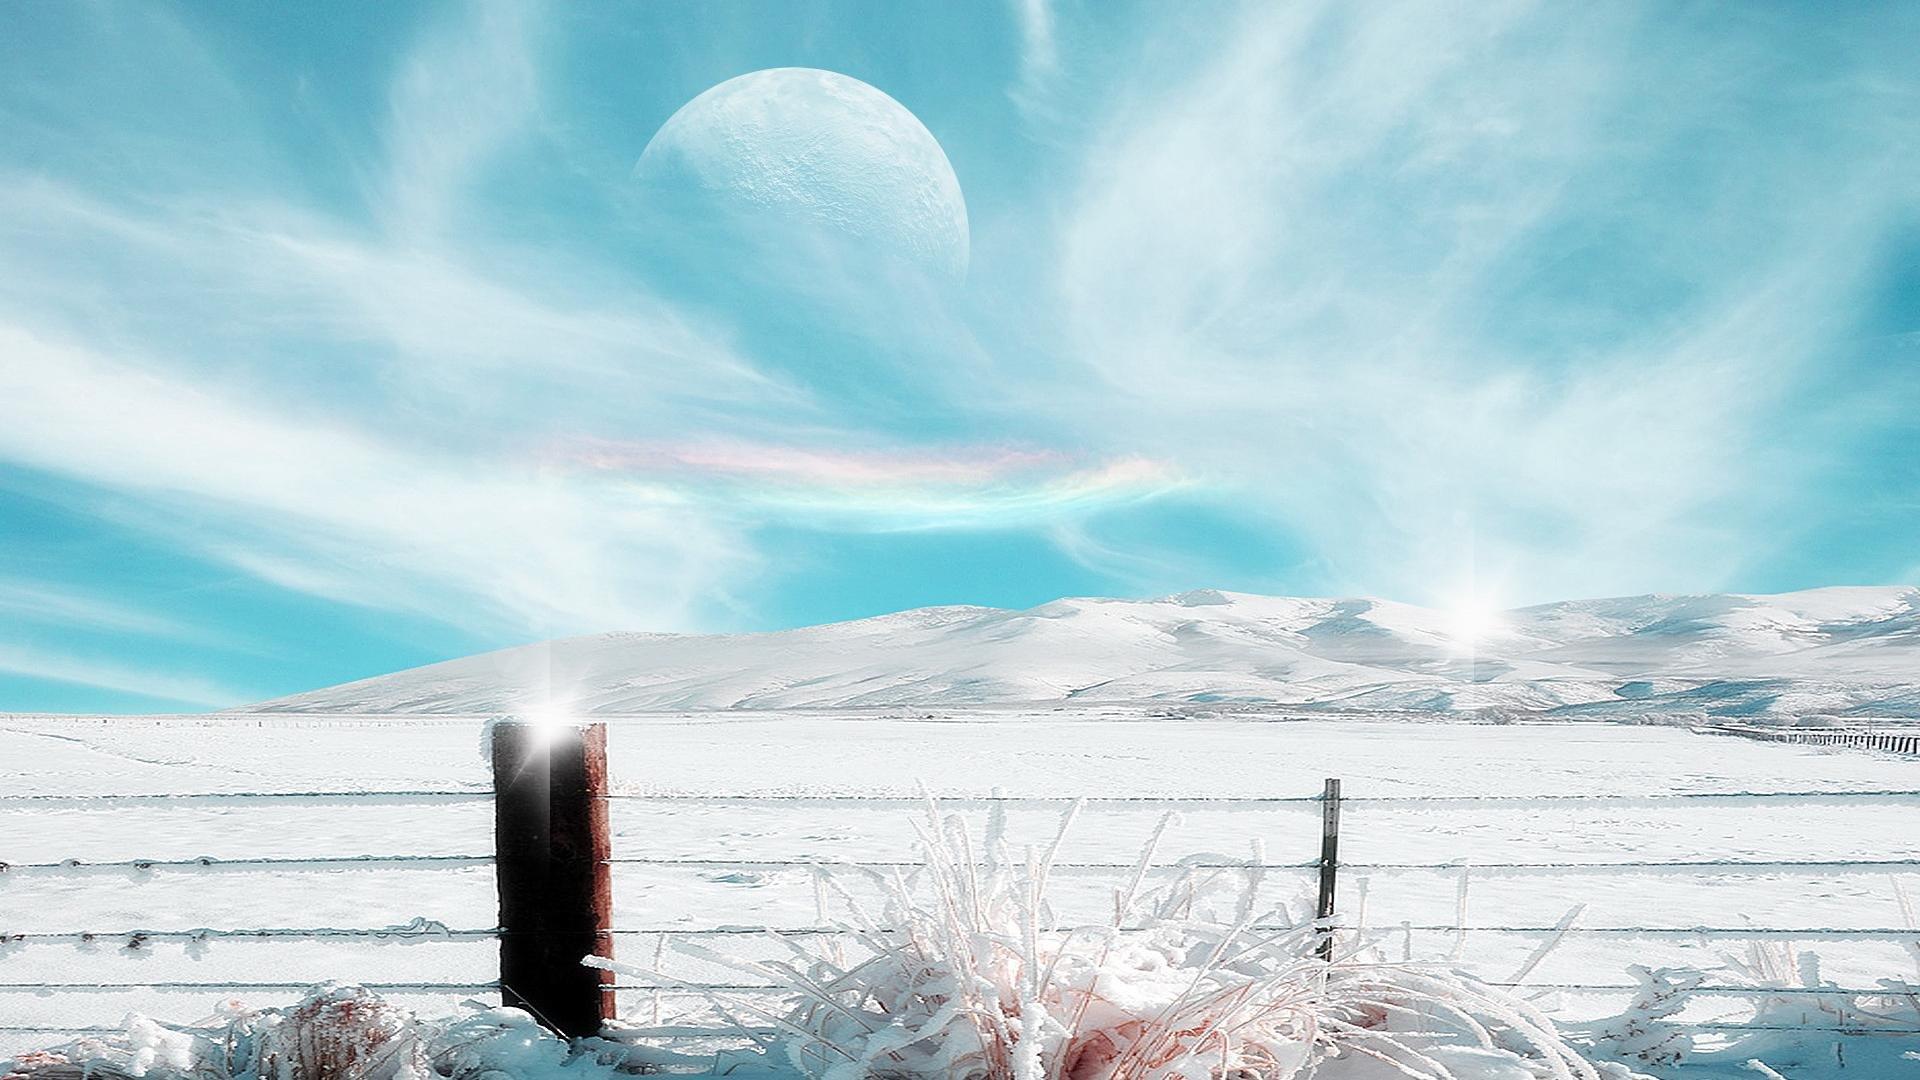 Hd wallpaper editor - Artistic Fantasy Artistic Winter Planet Landscape Snow Sky Wallpaper